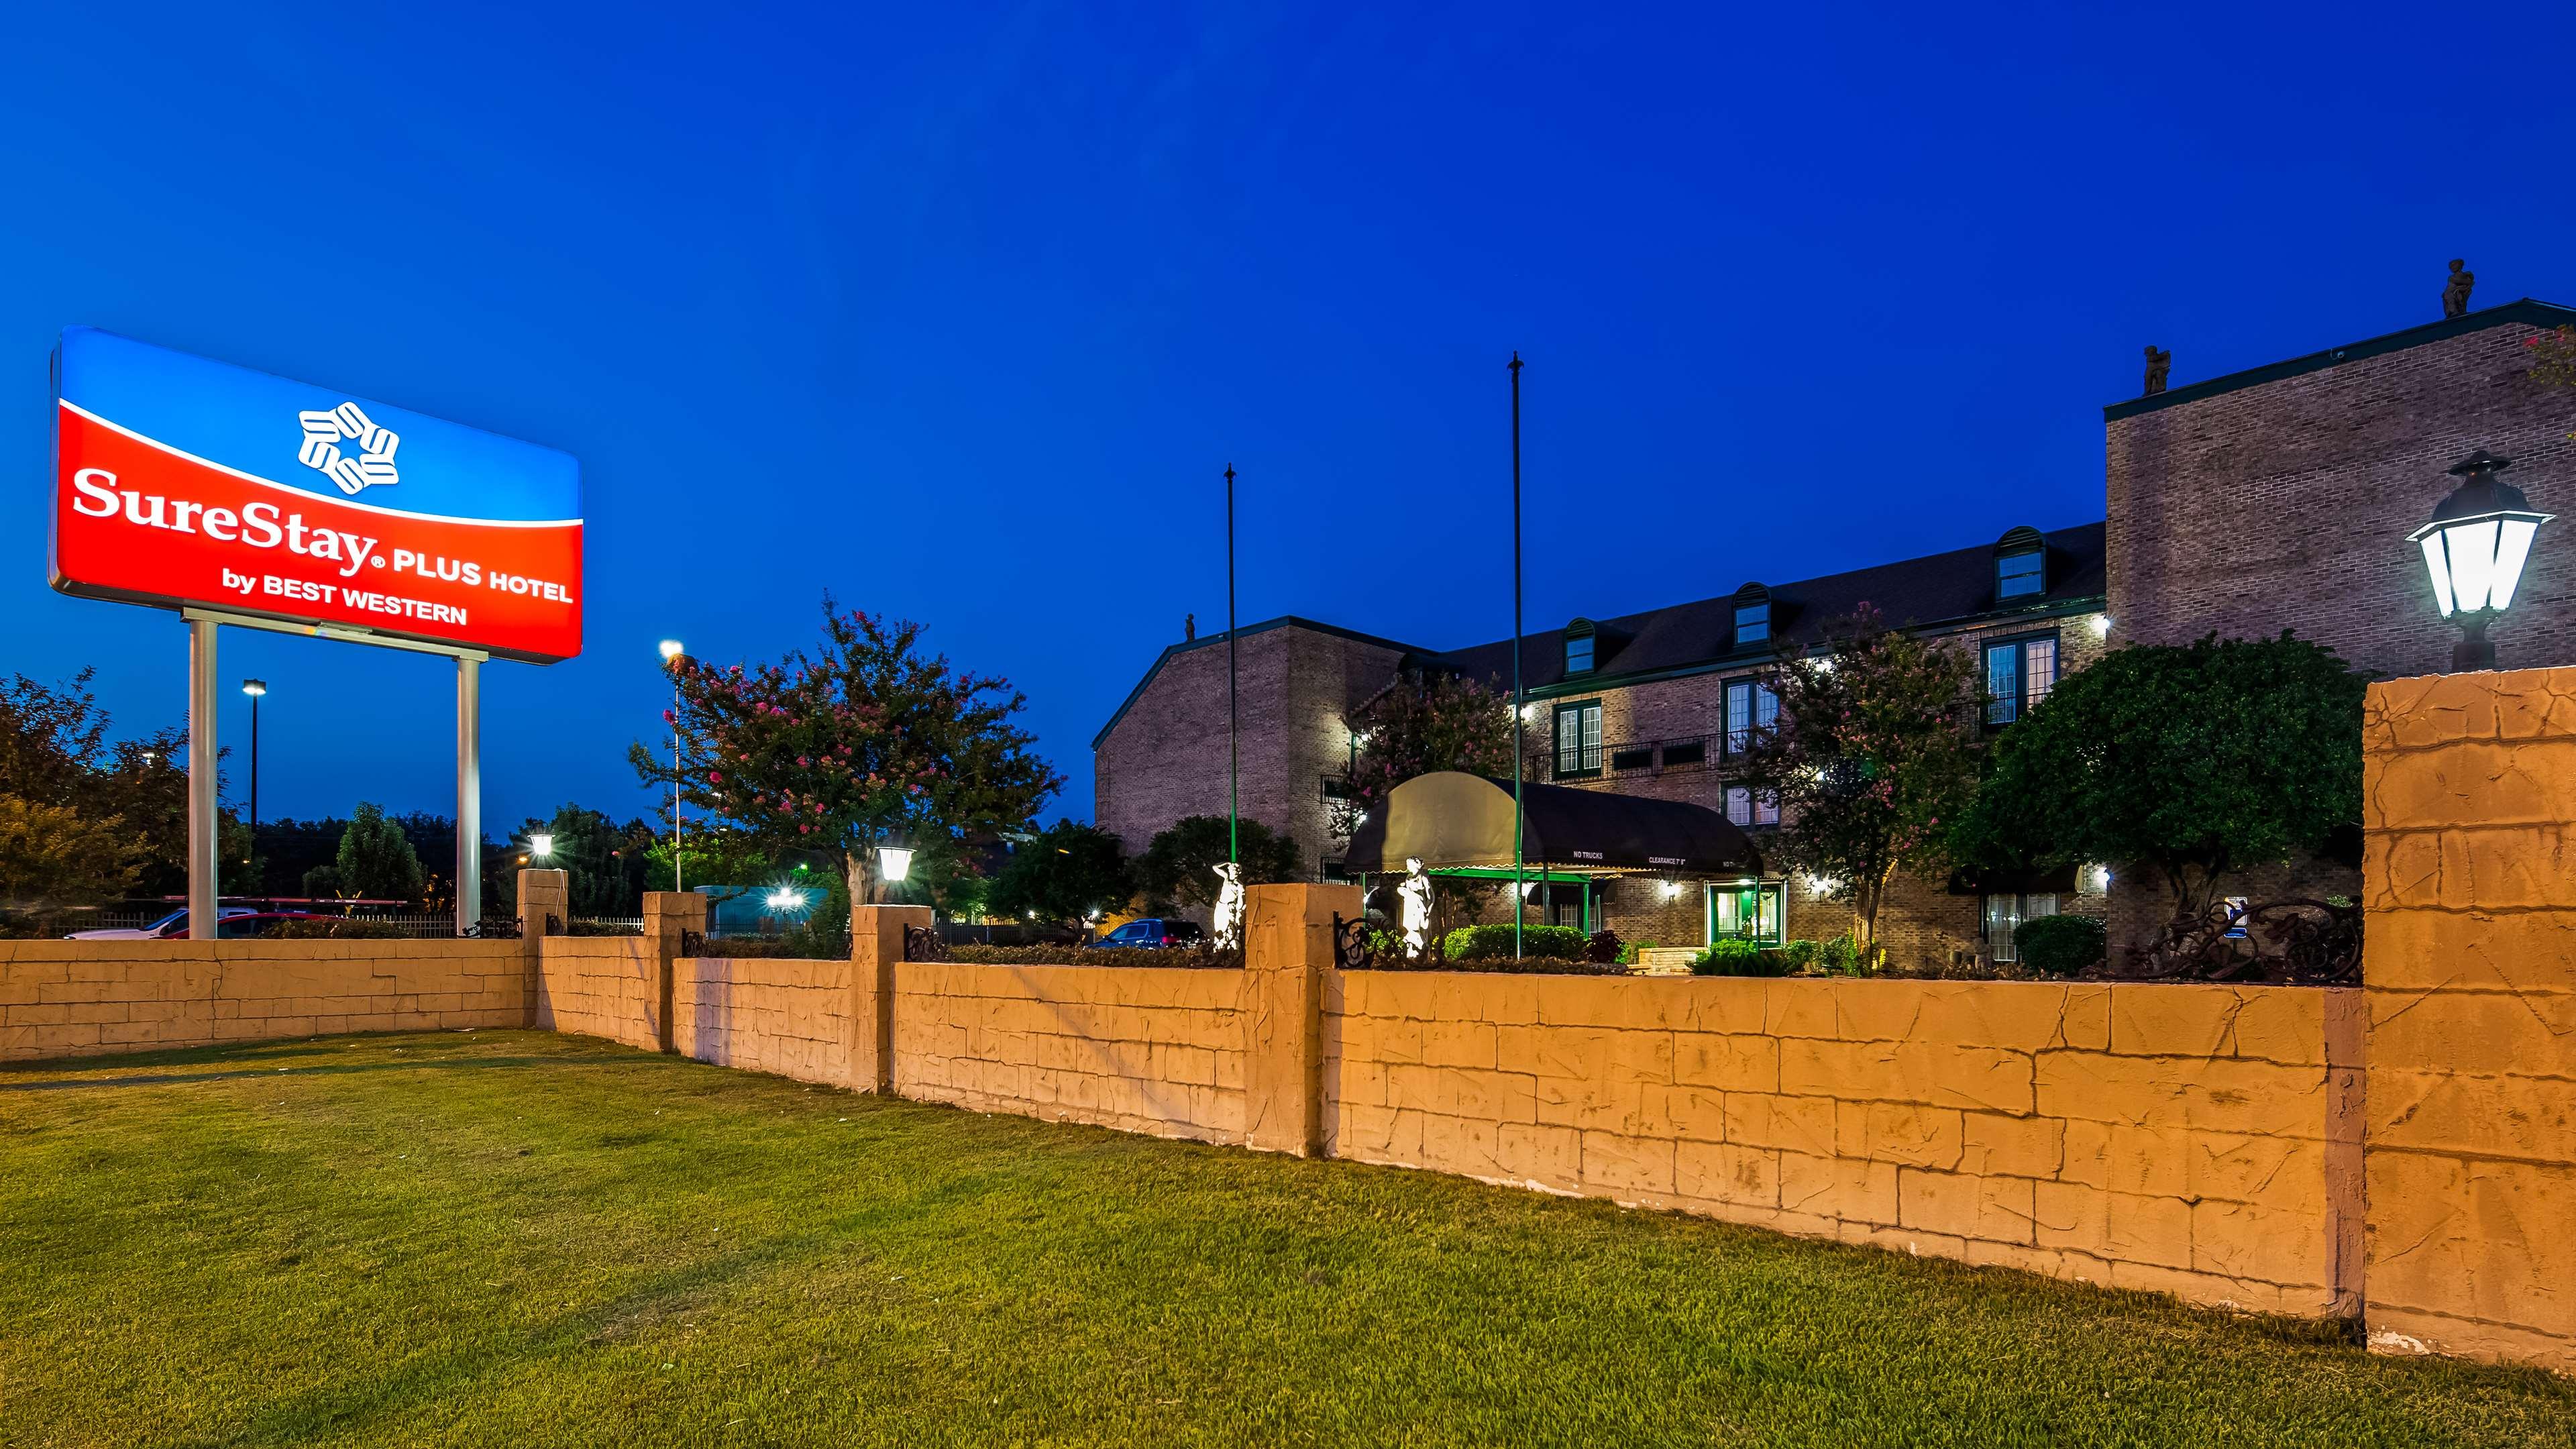 SureStay Plus Hotel by Best Western Baton Rouge image 1